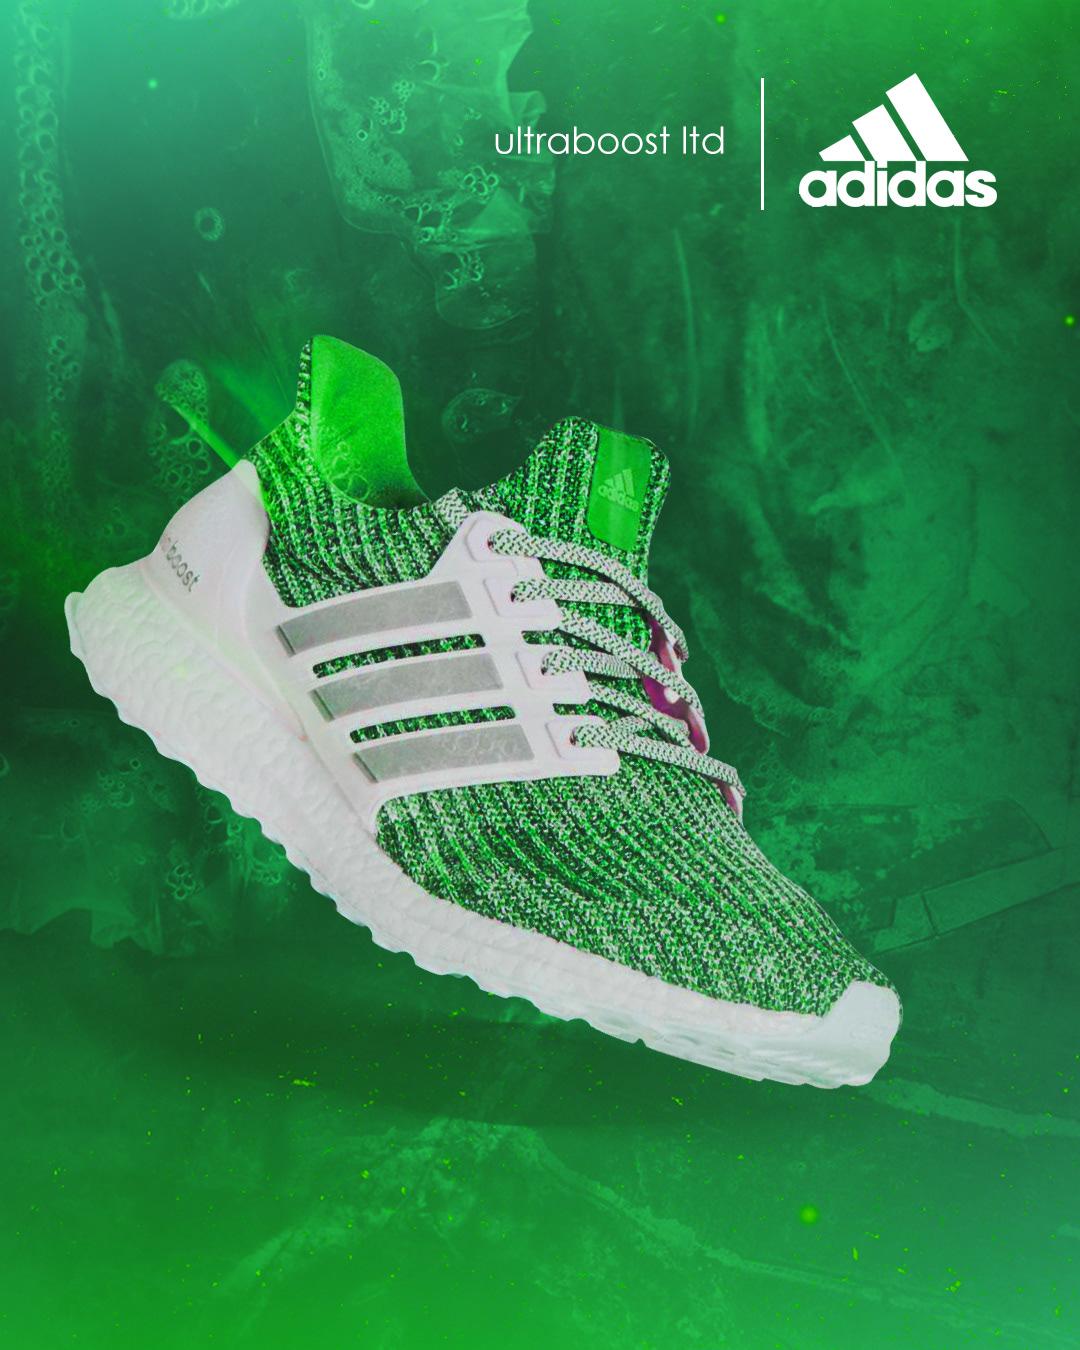 adidas Ultraboost LTD Advertisement on Behance